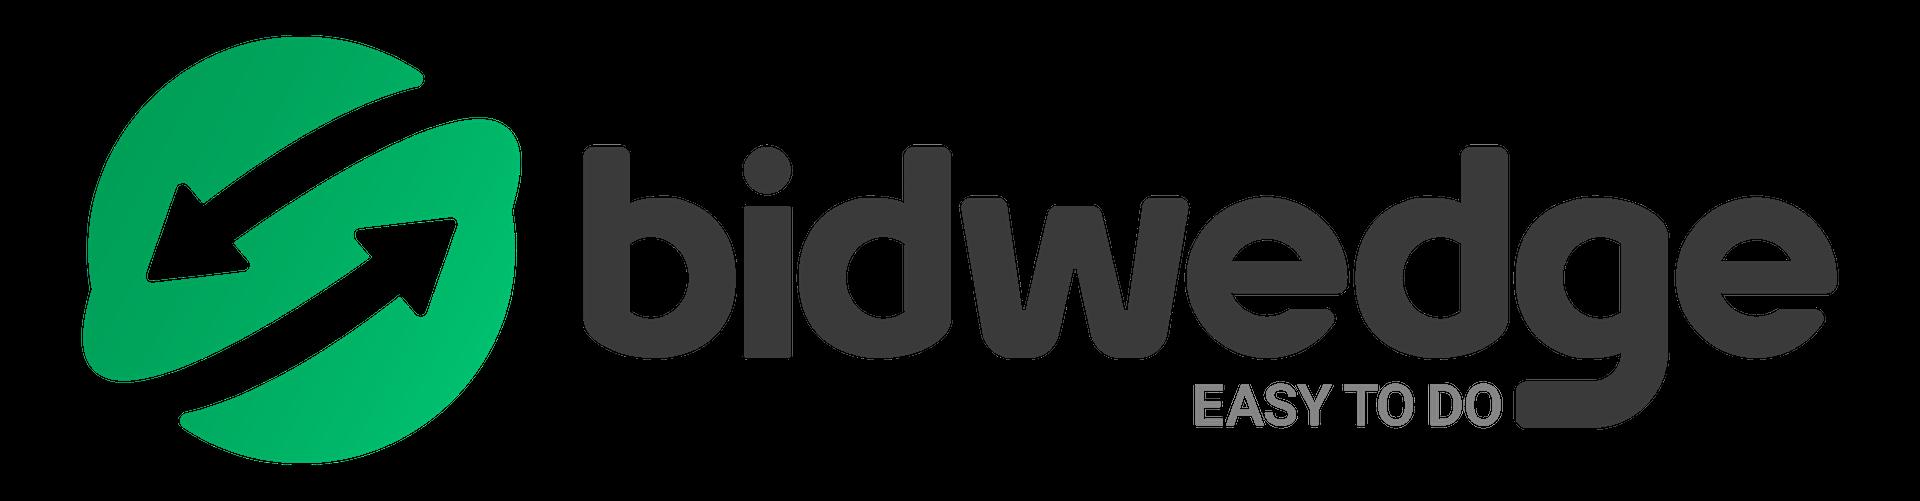 Bidwedge